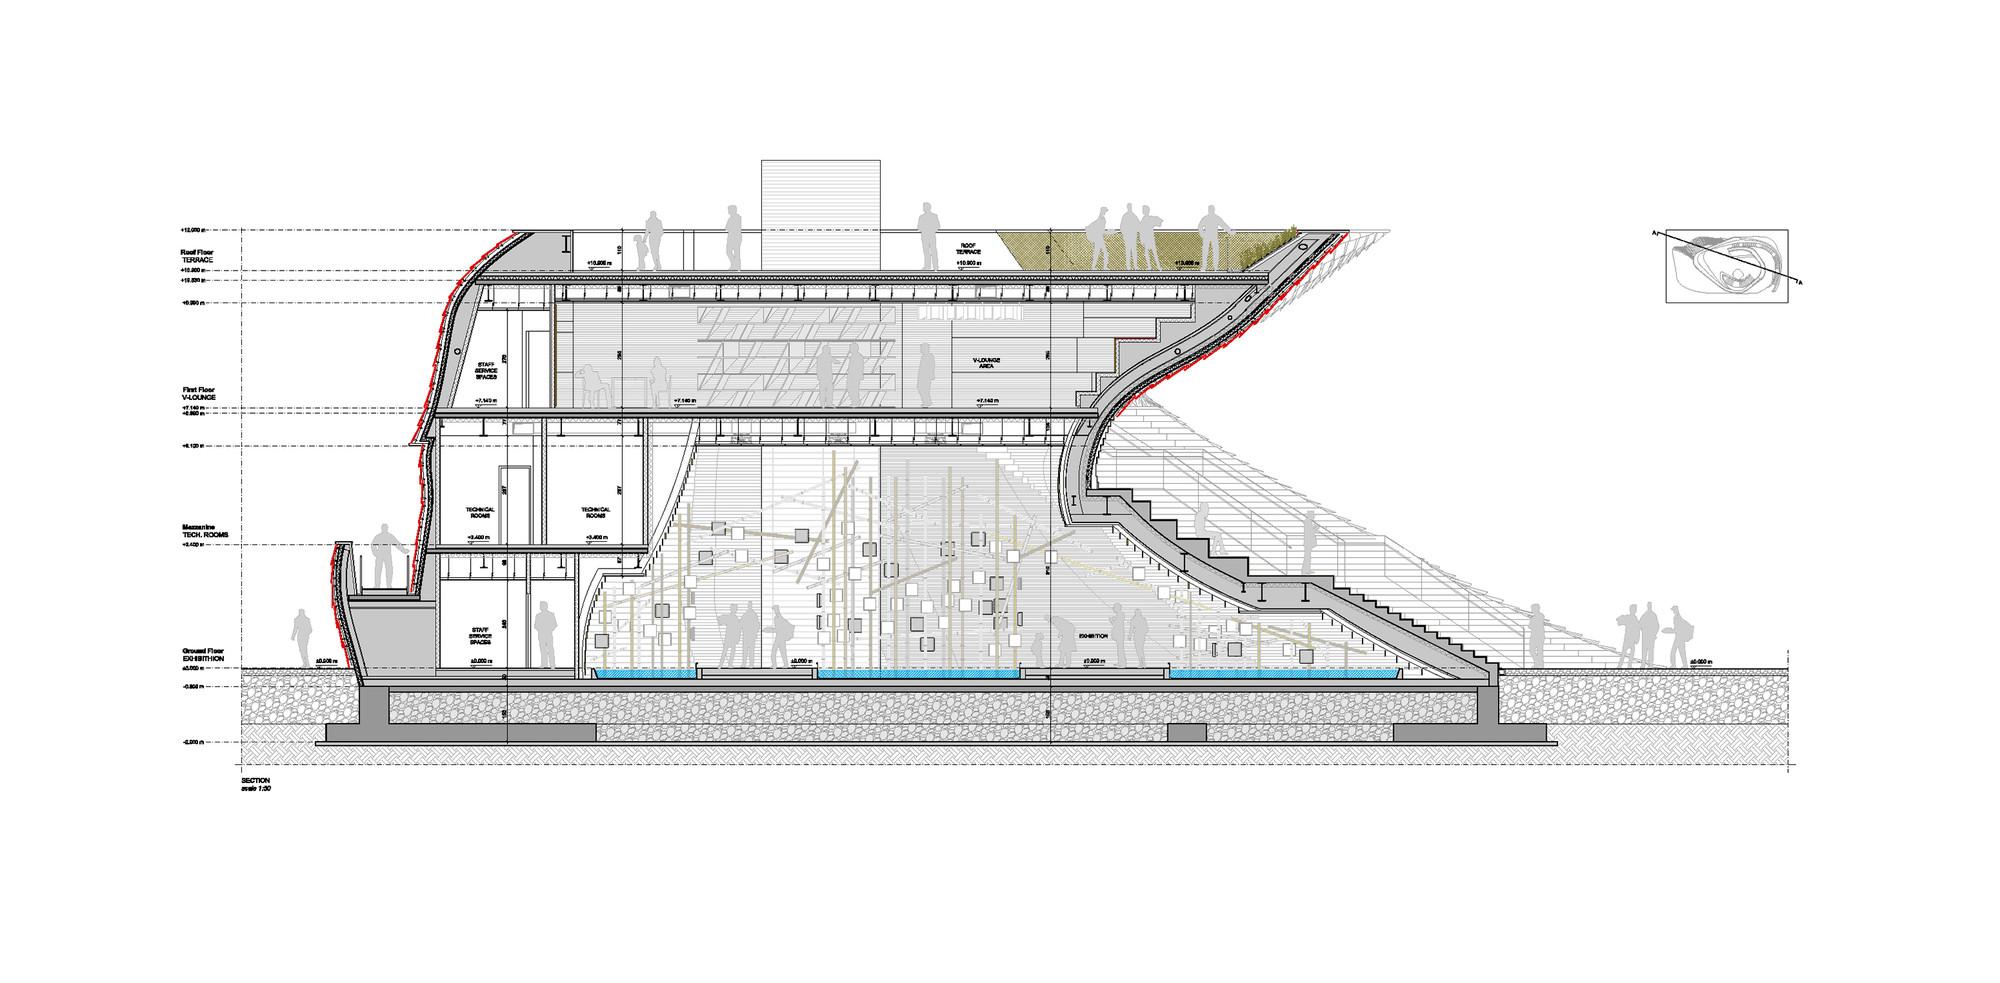 Zaha Hadid Floor Plans Gallery Of Vanke Pavilion Milan Expo 2015 Daniel